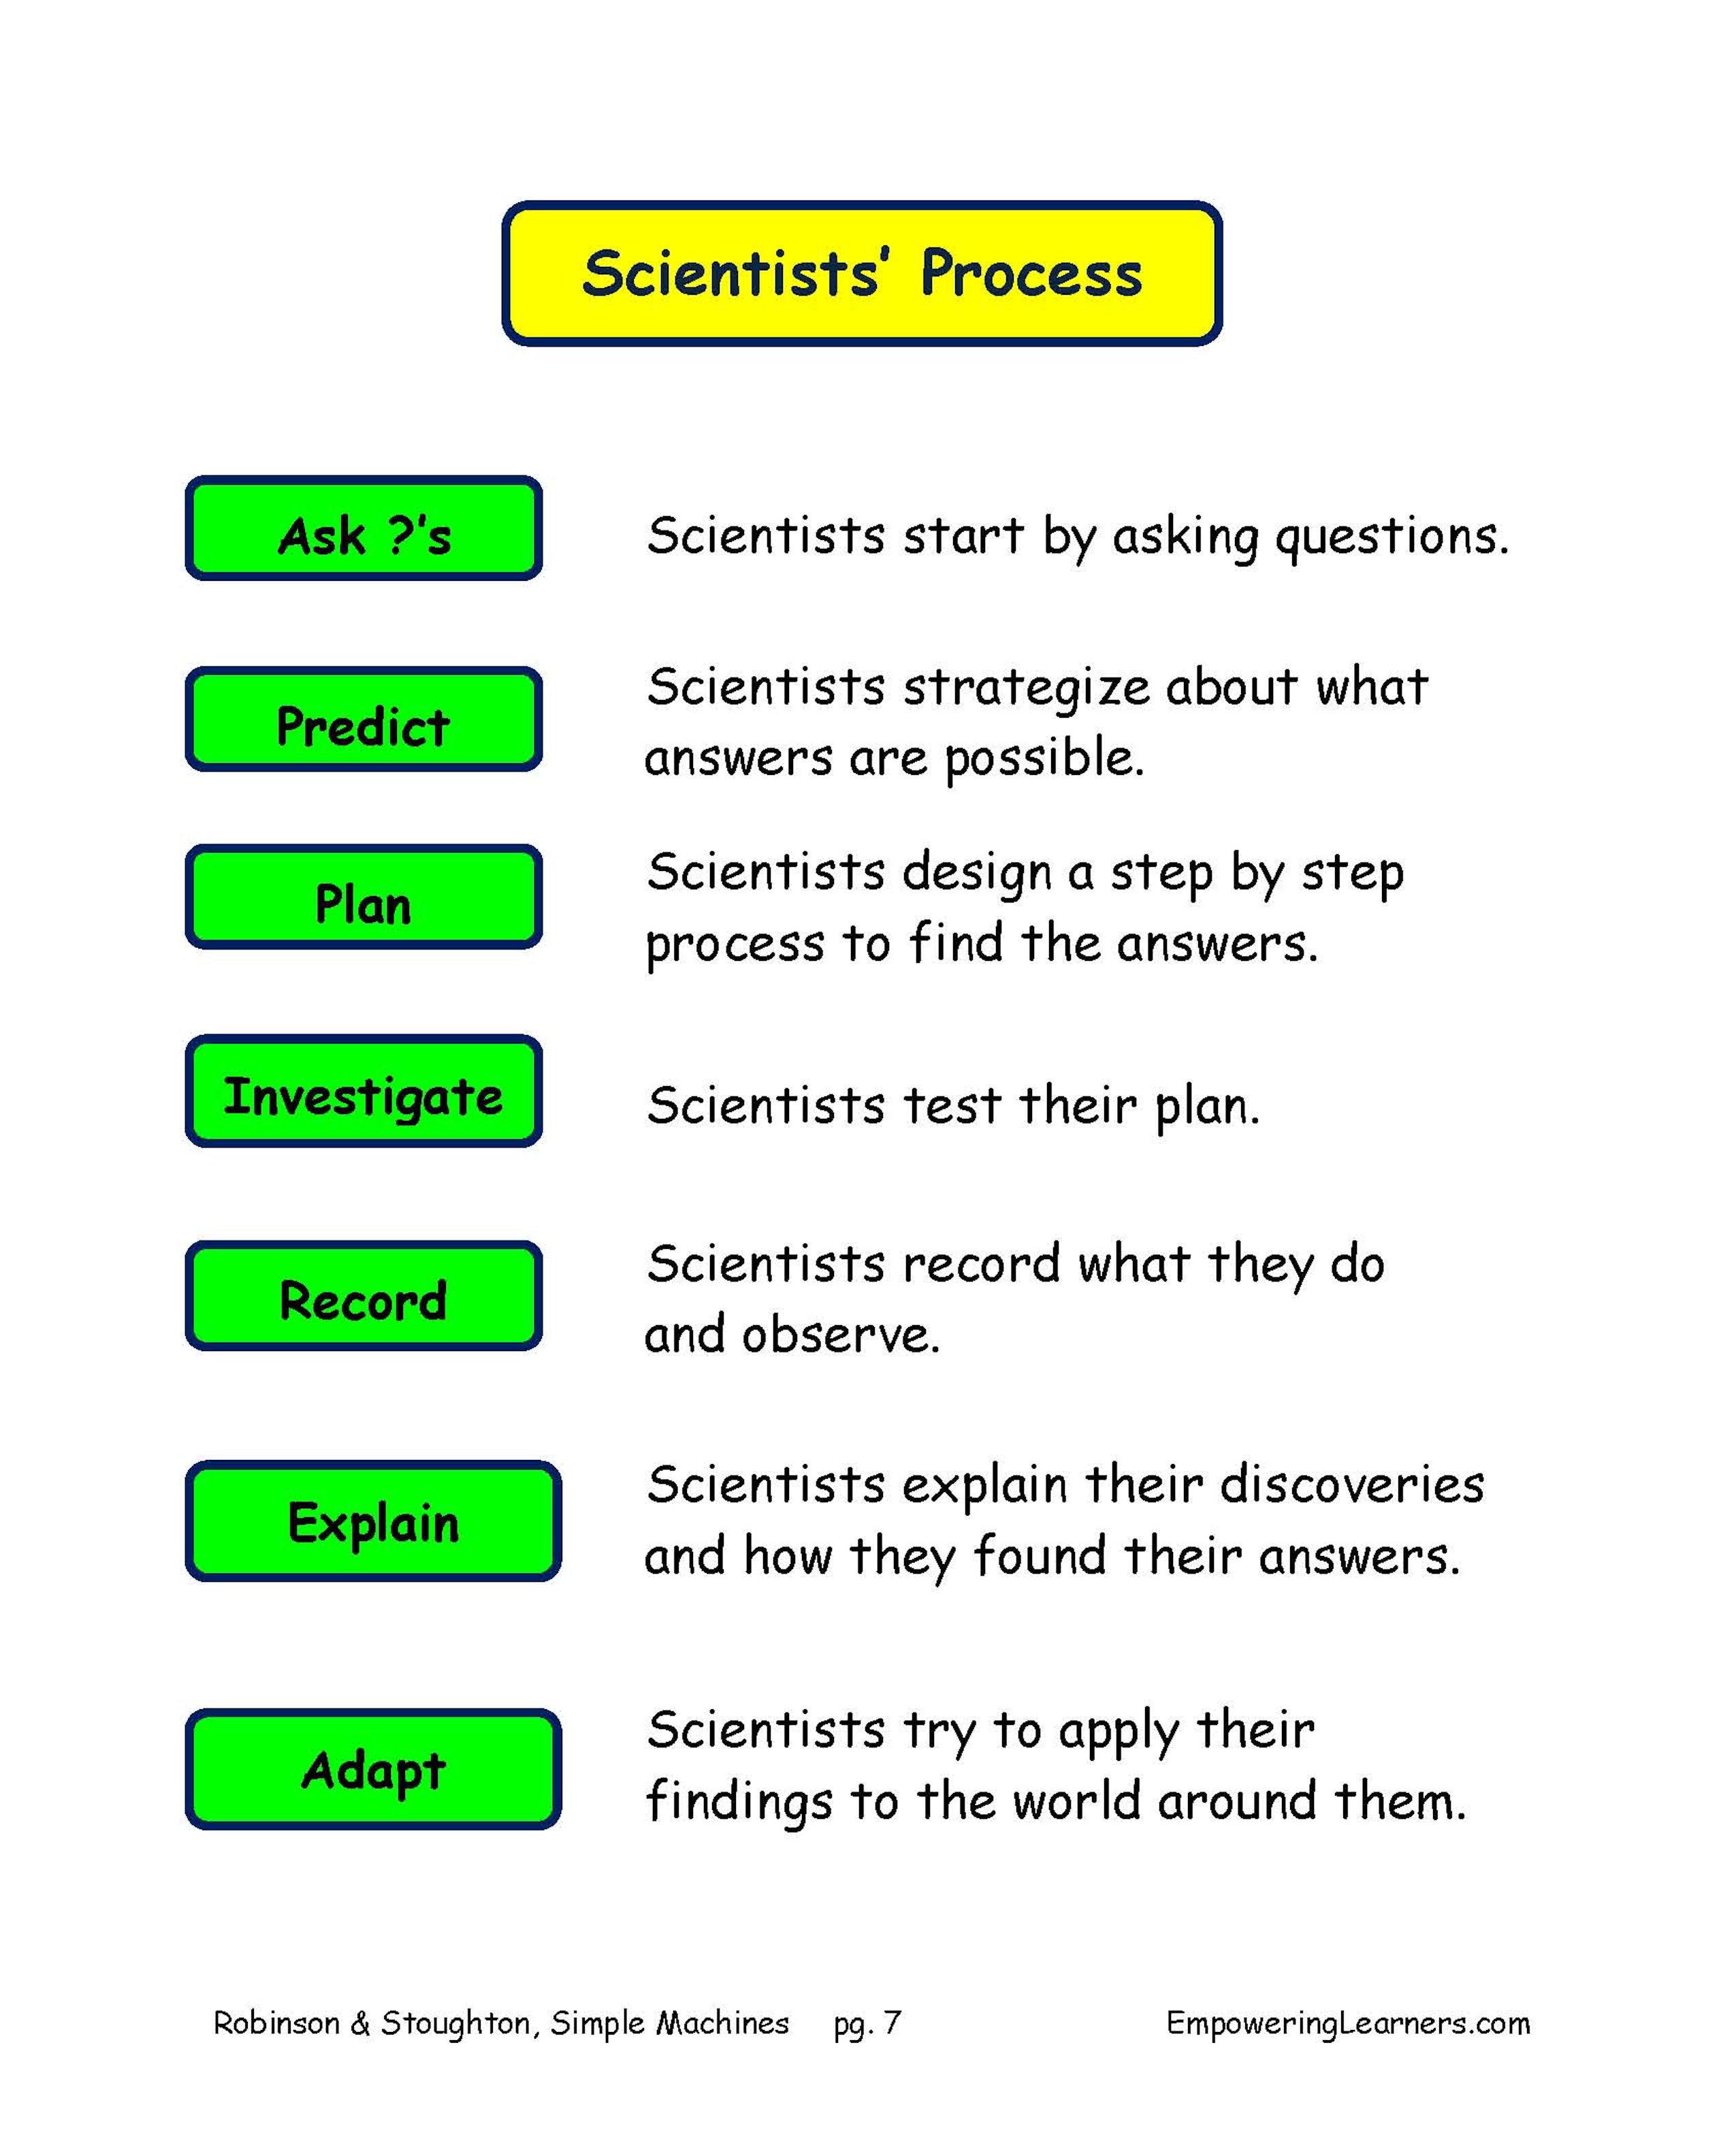 Scientific Process for Kids